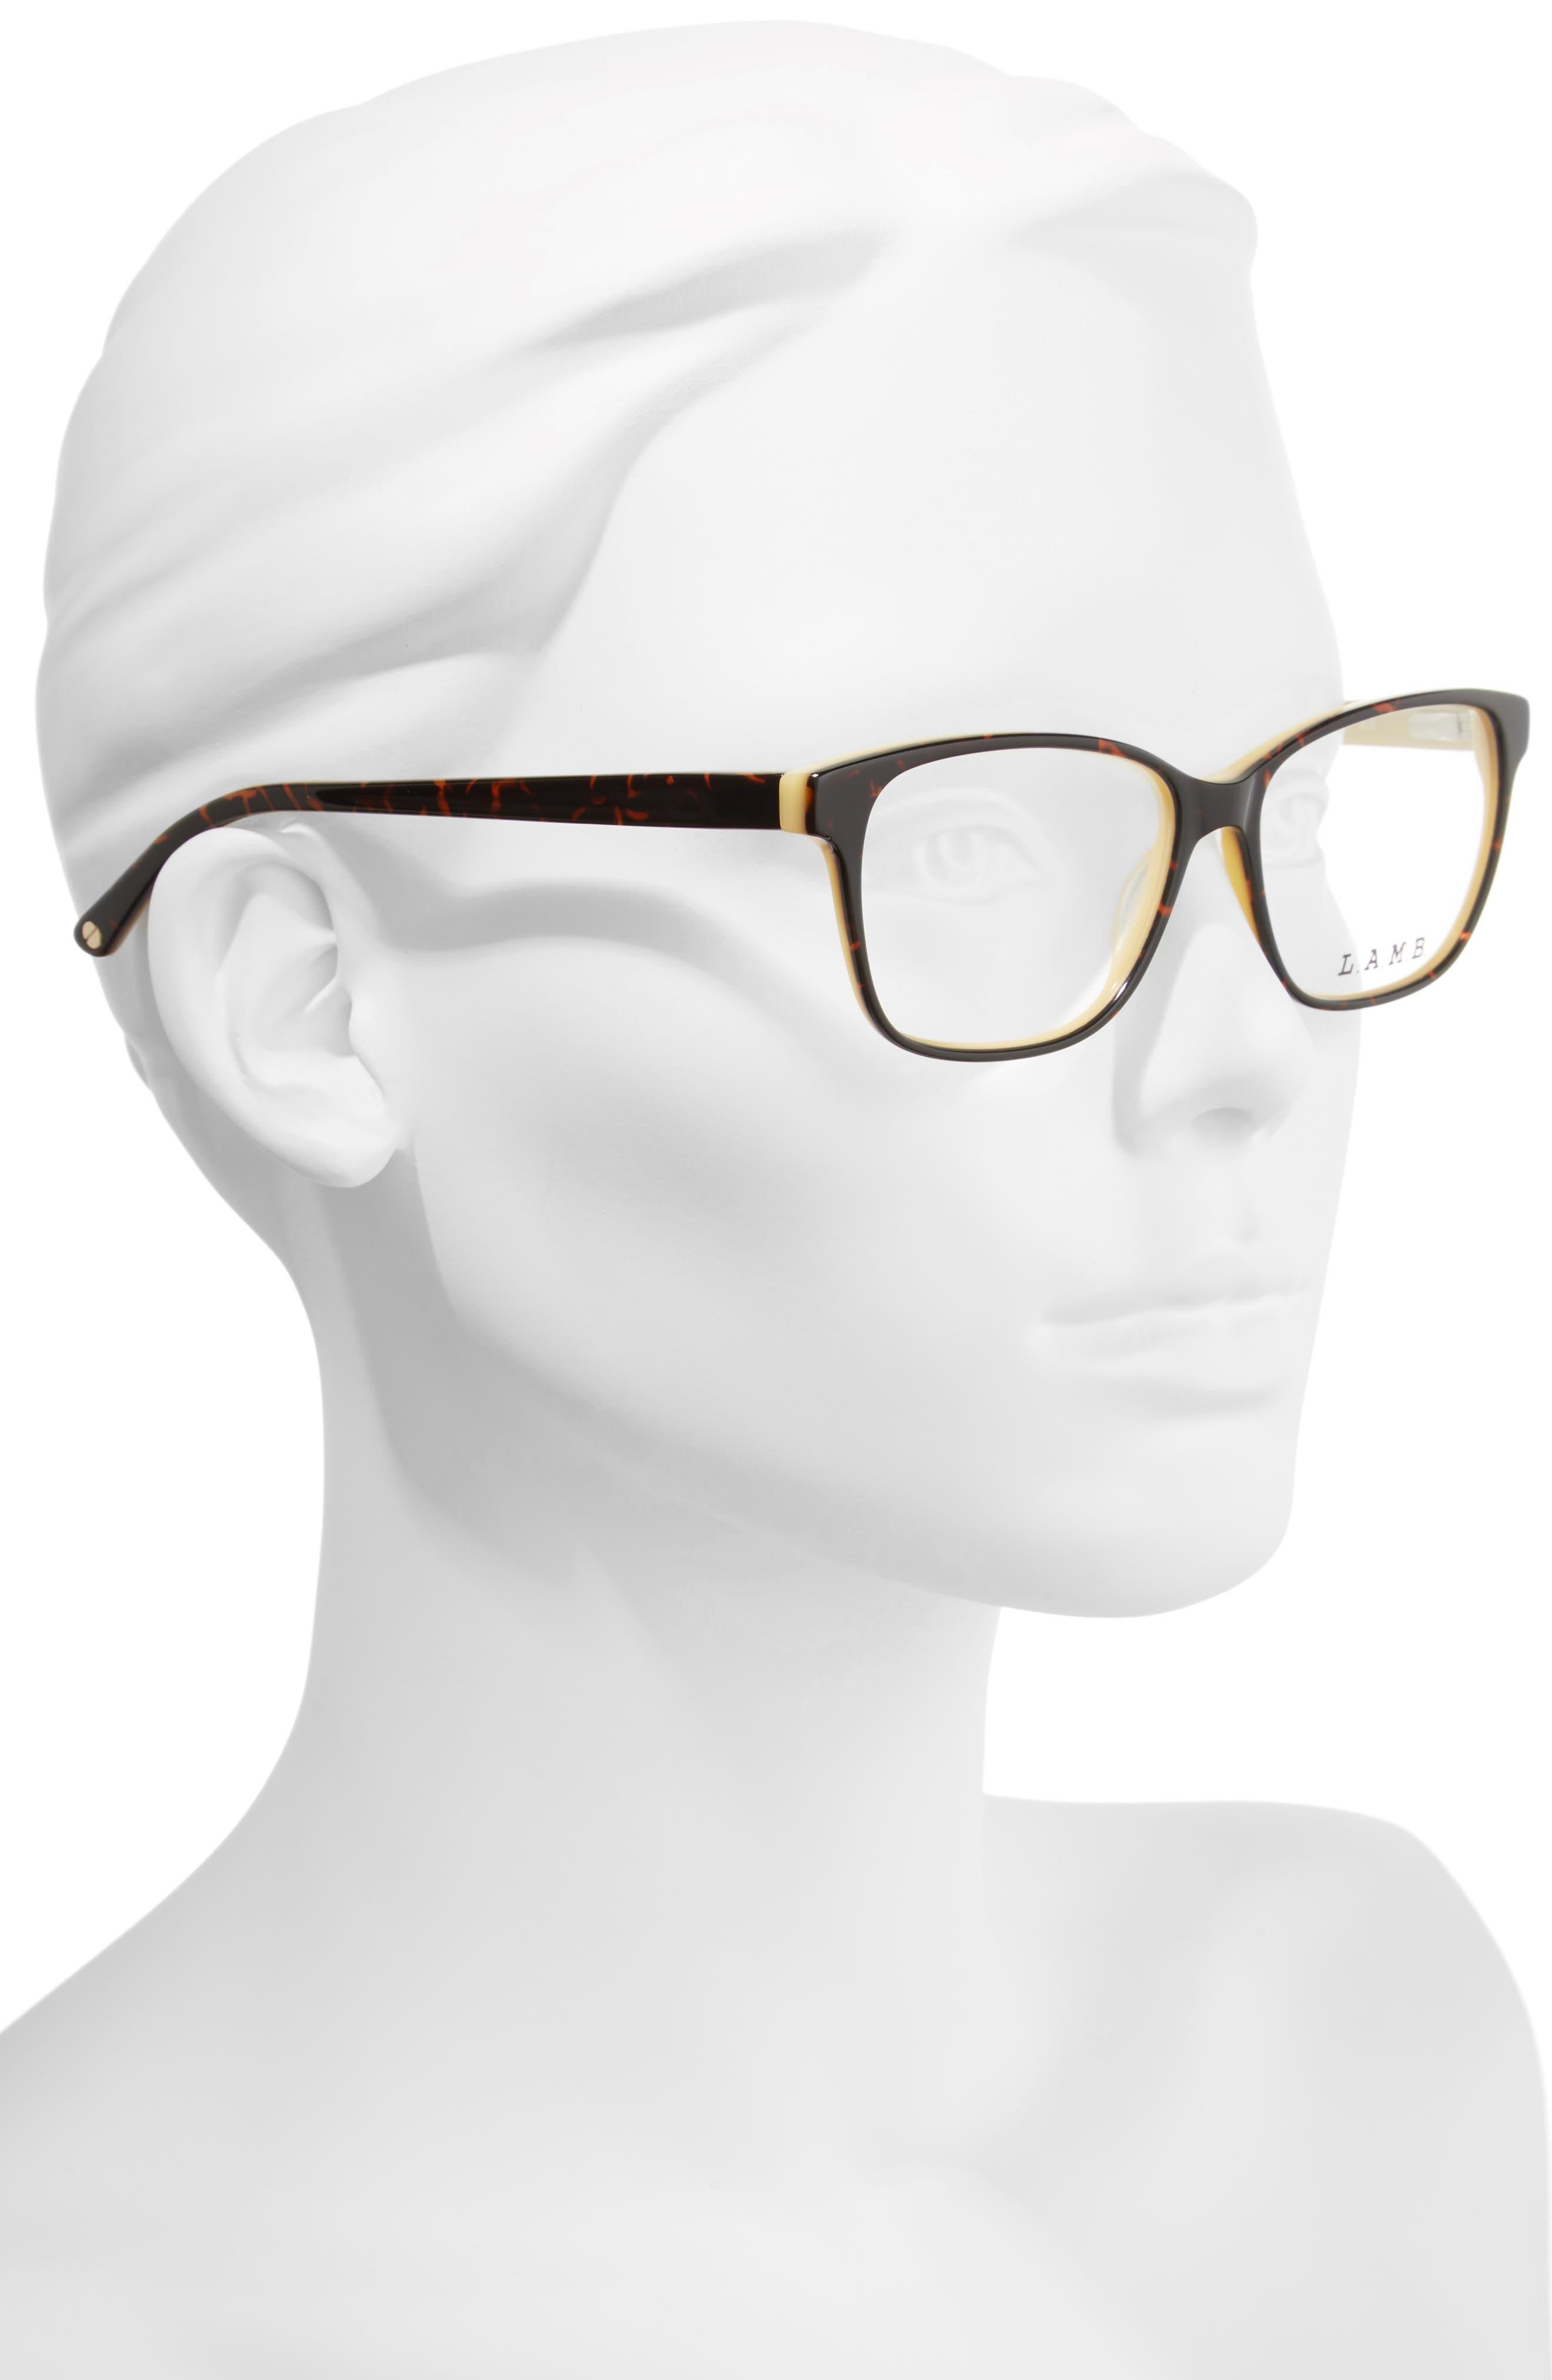 54mm Square Optical Glasses,                             Alternate thumbnail 4, color,